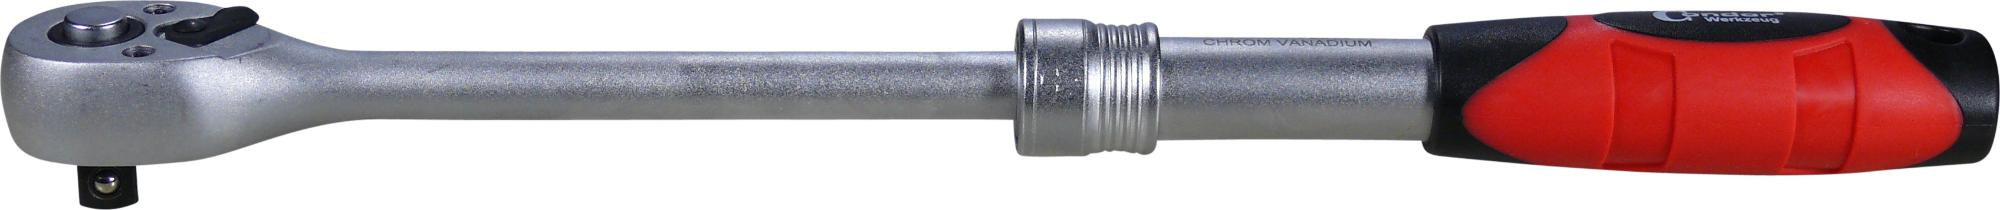 "Račňa teleskopická, 3/8"", 220-320 mm"